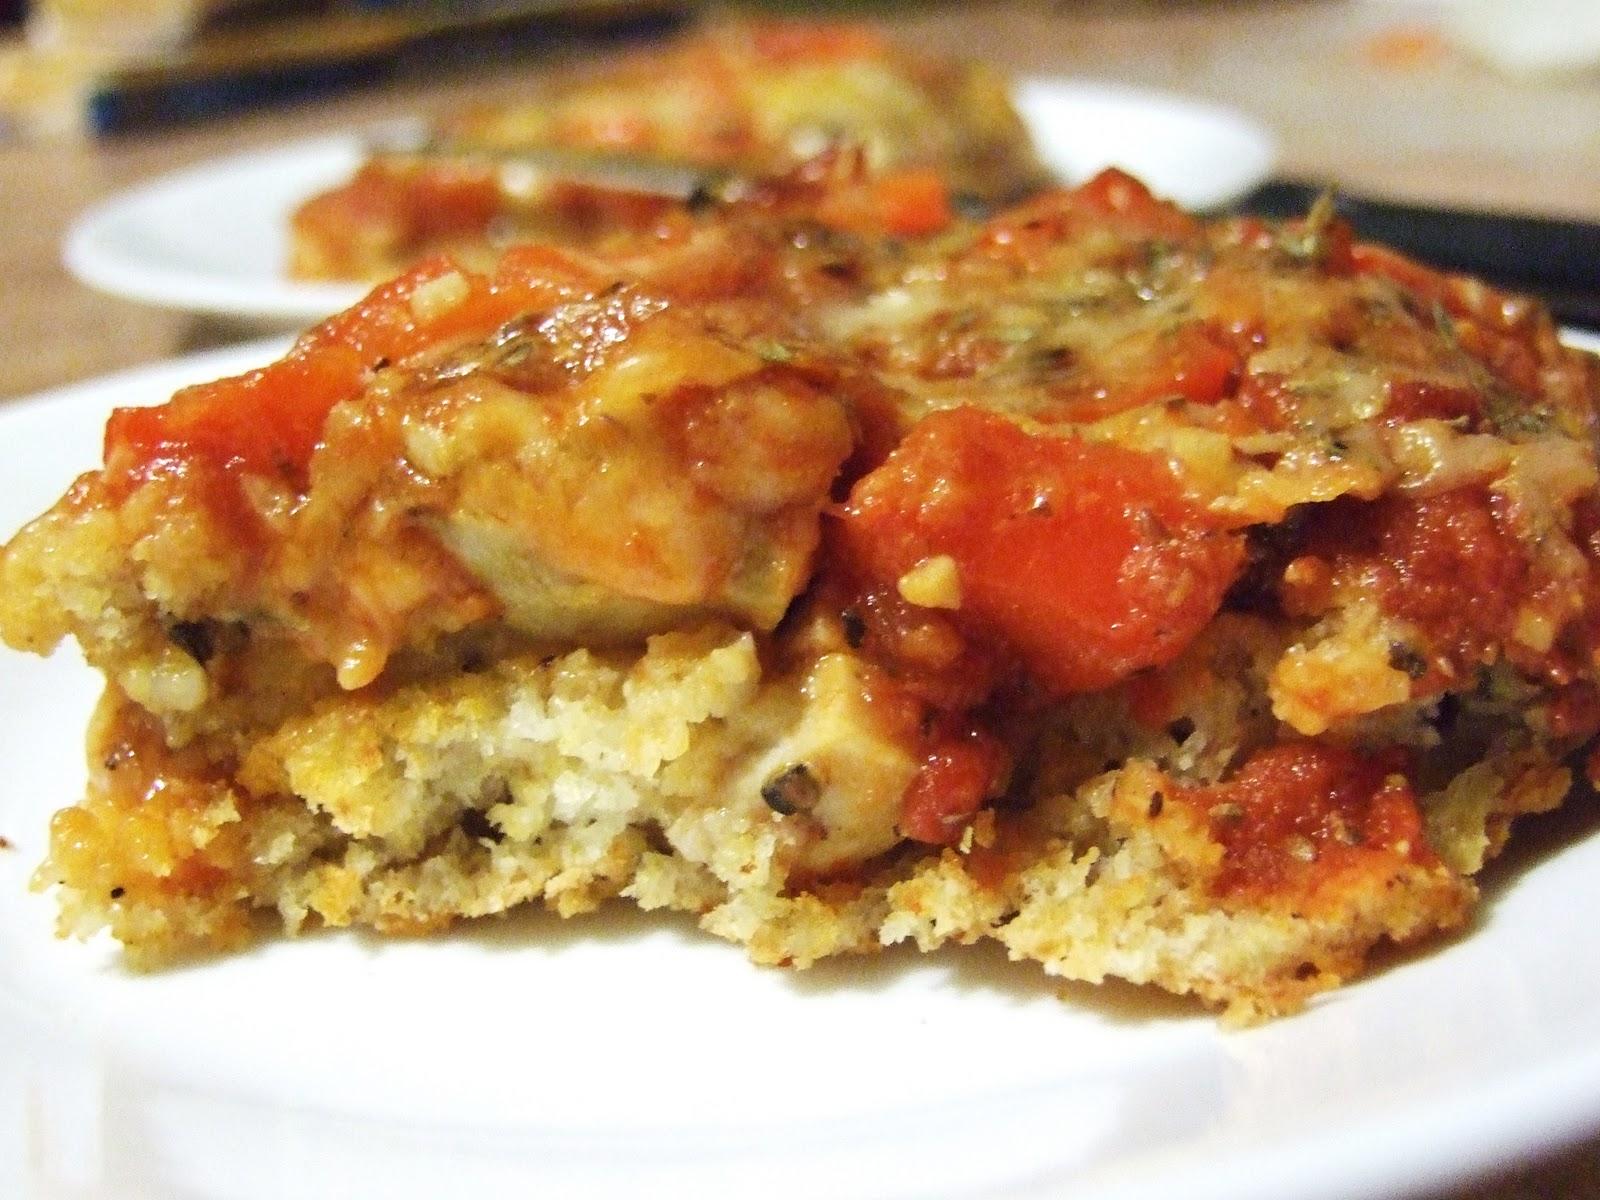 http://2.bp.blogspot.com/-J01hDAkro_E/TpzIRH4ey6I/AAAAAAAAArY/yIEV3kUQNEM/s1600/chicken+parm+casserole+038.JPG